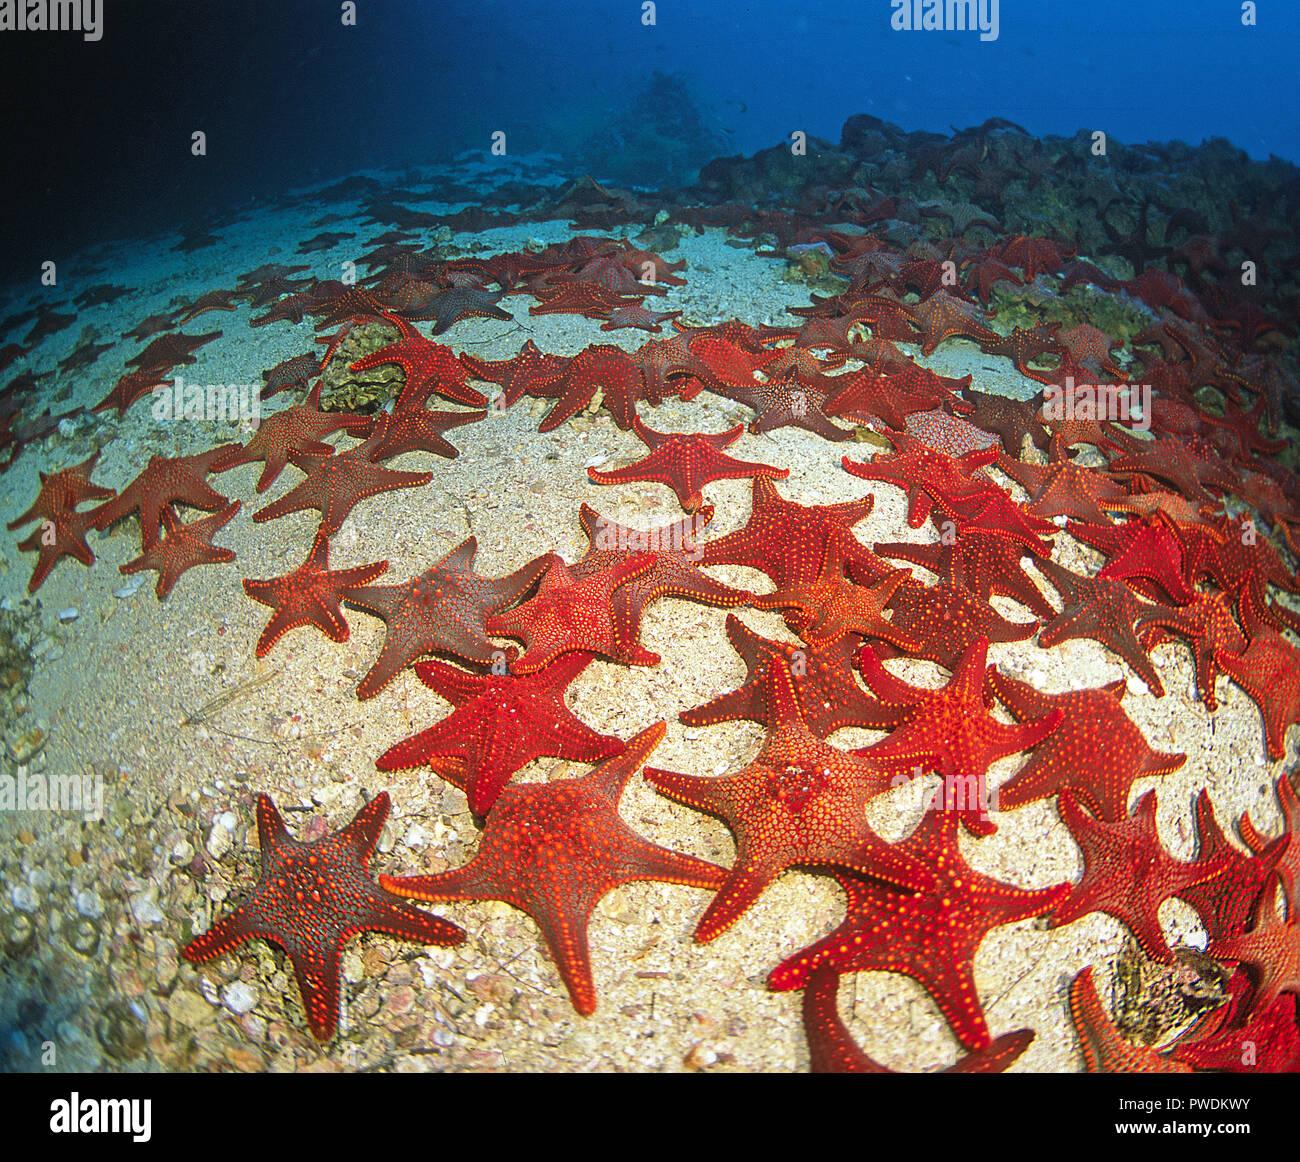 Many Panamic cushion sea stars, Cuming's sea star or Galapagos sea star (Pentaceraster cumingi), Galapagos islands, Ecuador - Stock Image